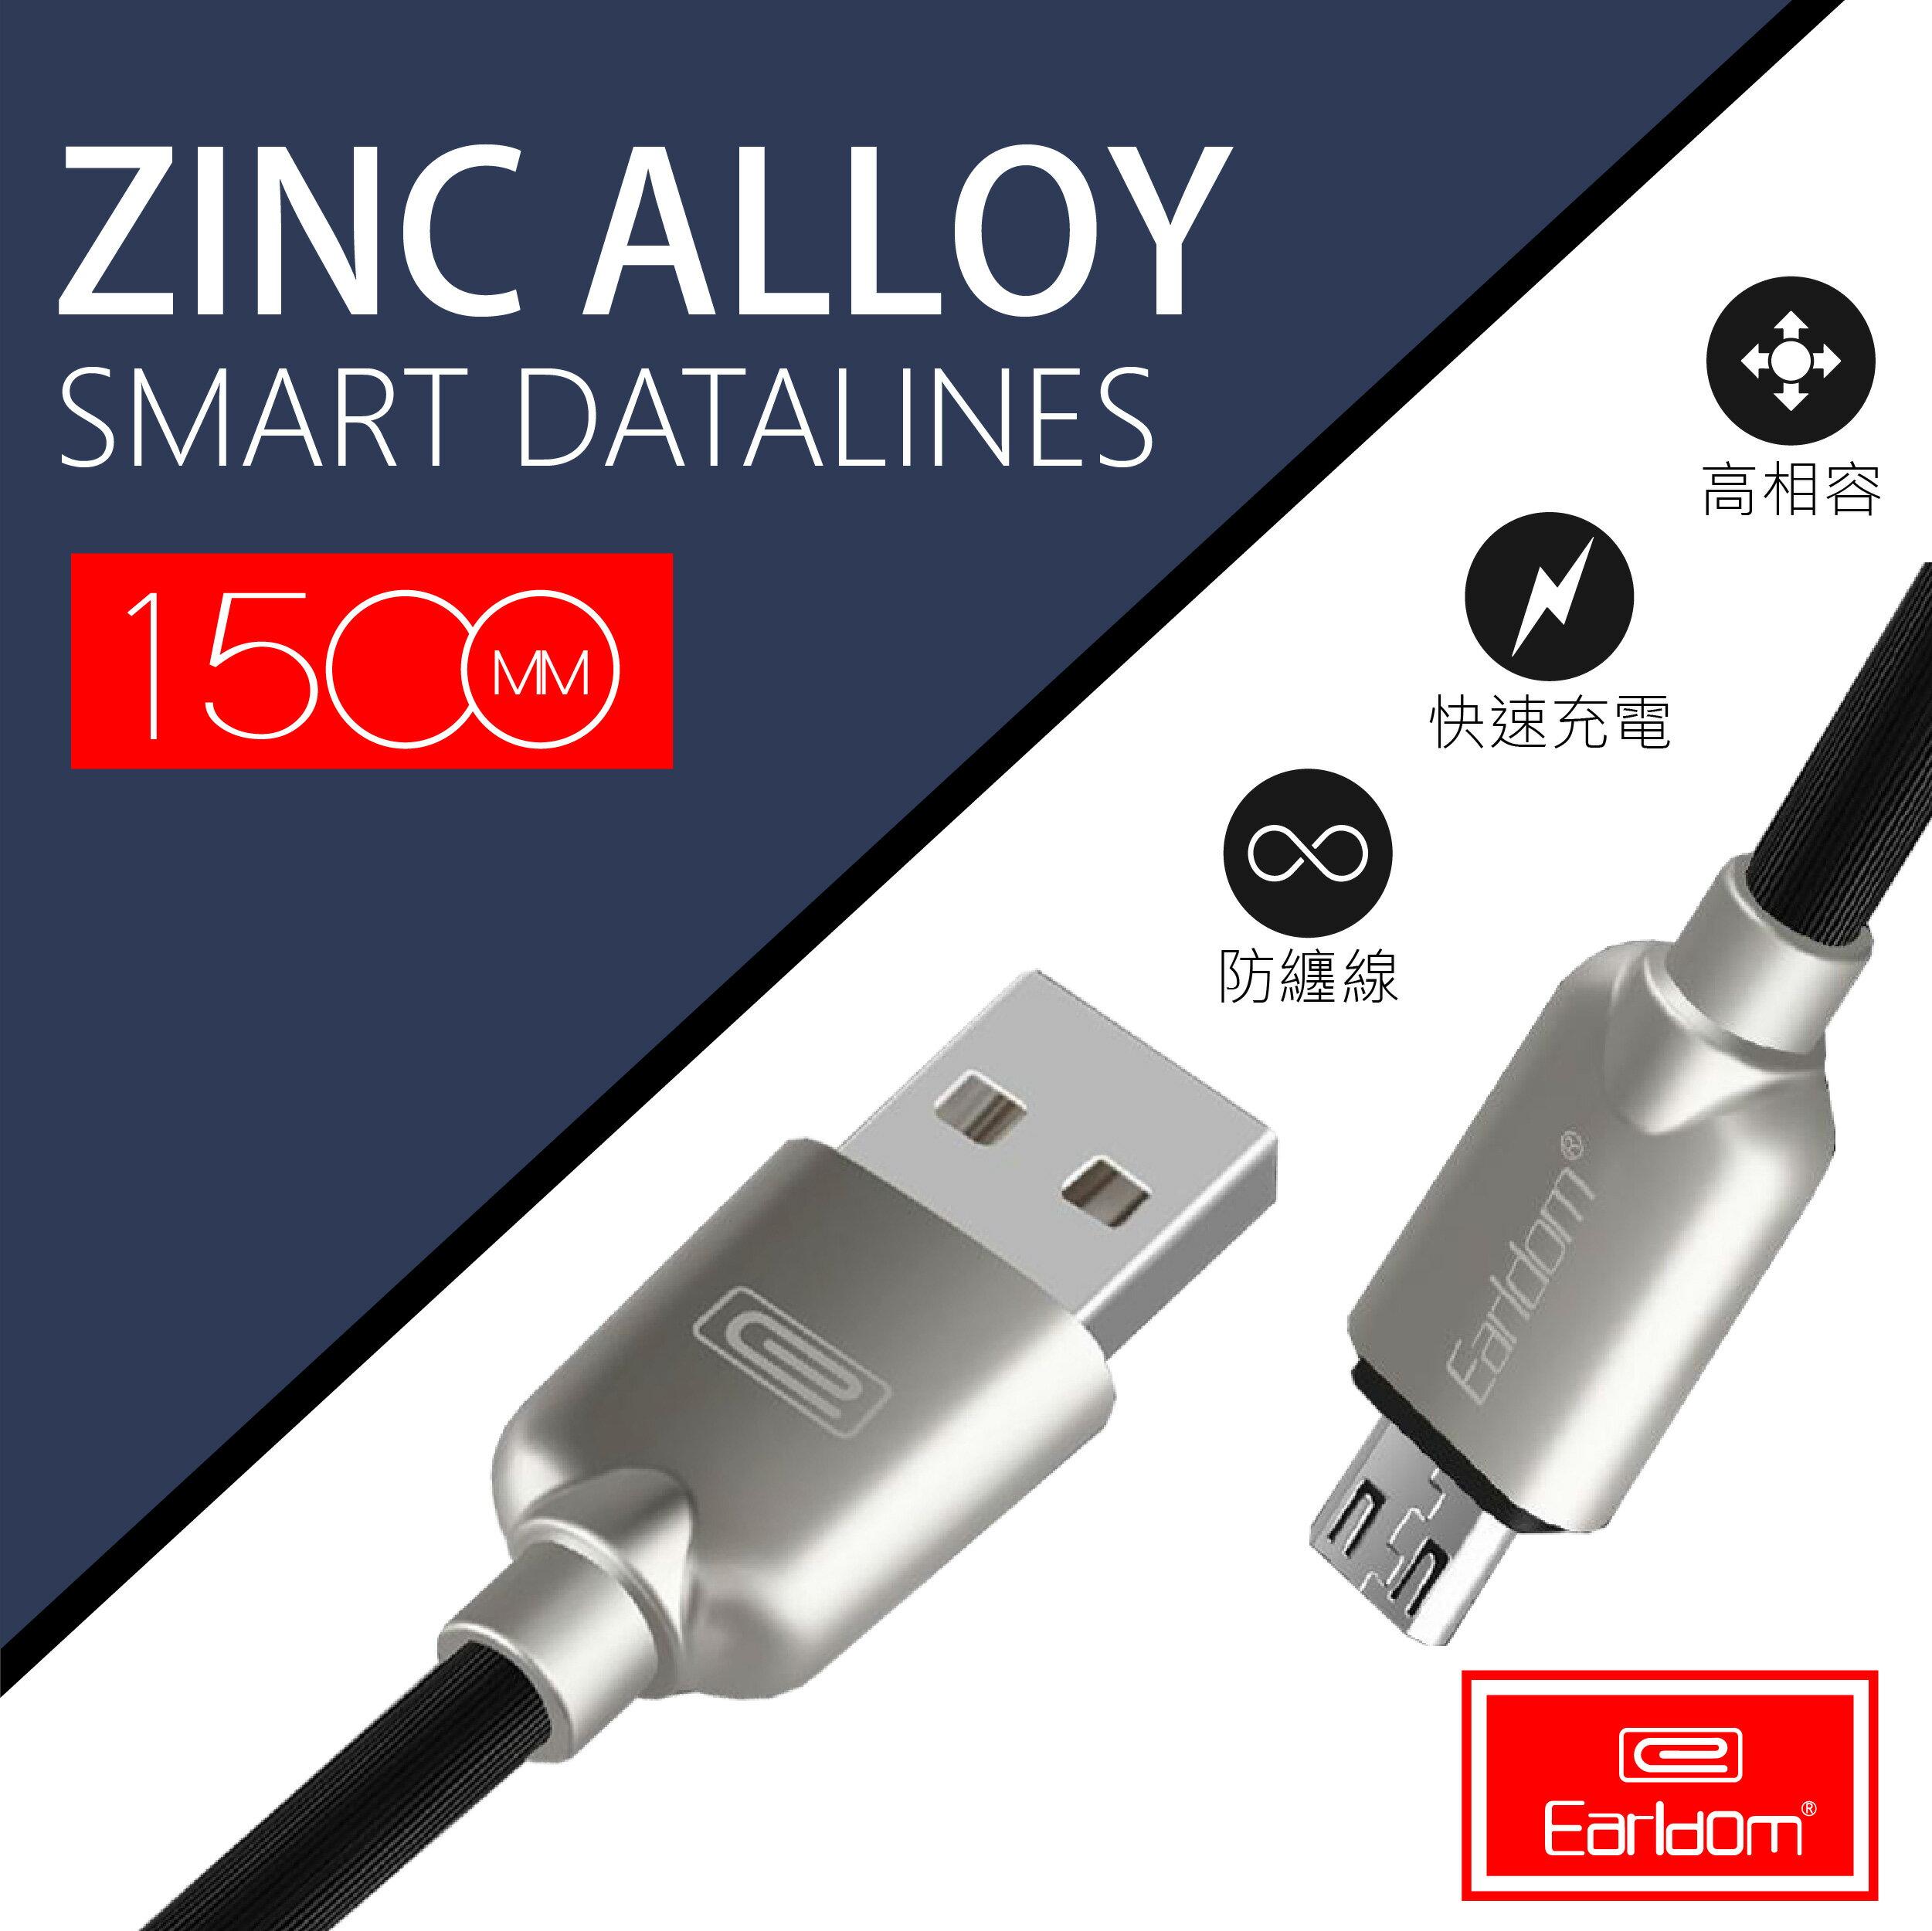 【coni shop】國際領導品牌 Earldom EC-005 高速2.1A快充 一米五 傳輸線 高品銅芯線 過載保護